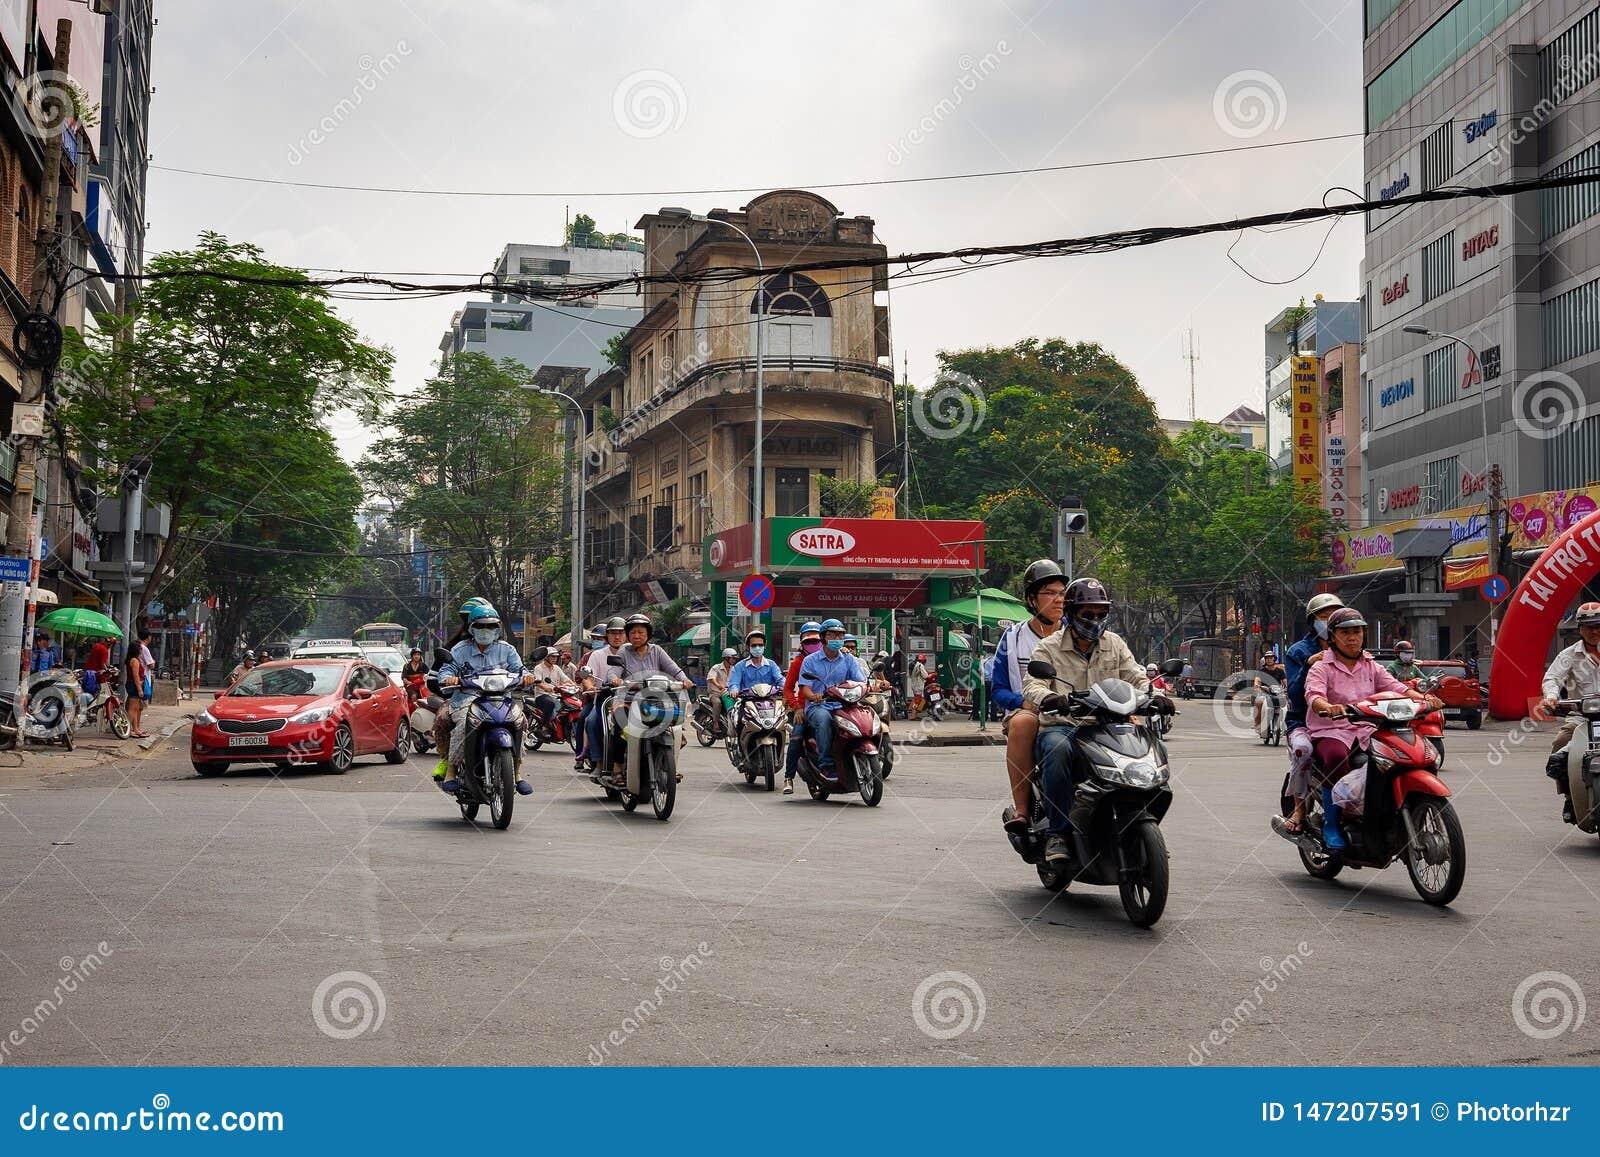 HO CHI MINH, SAIGON, VIETNAM - 25 DICEMBRE 2016: Un ingorgo stradale nella città di Ho Chi Minh, Vietnam Hundrgeds del ciclomotor